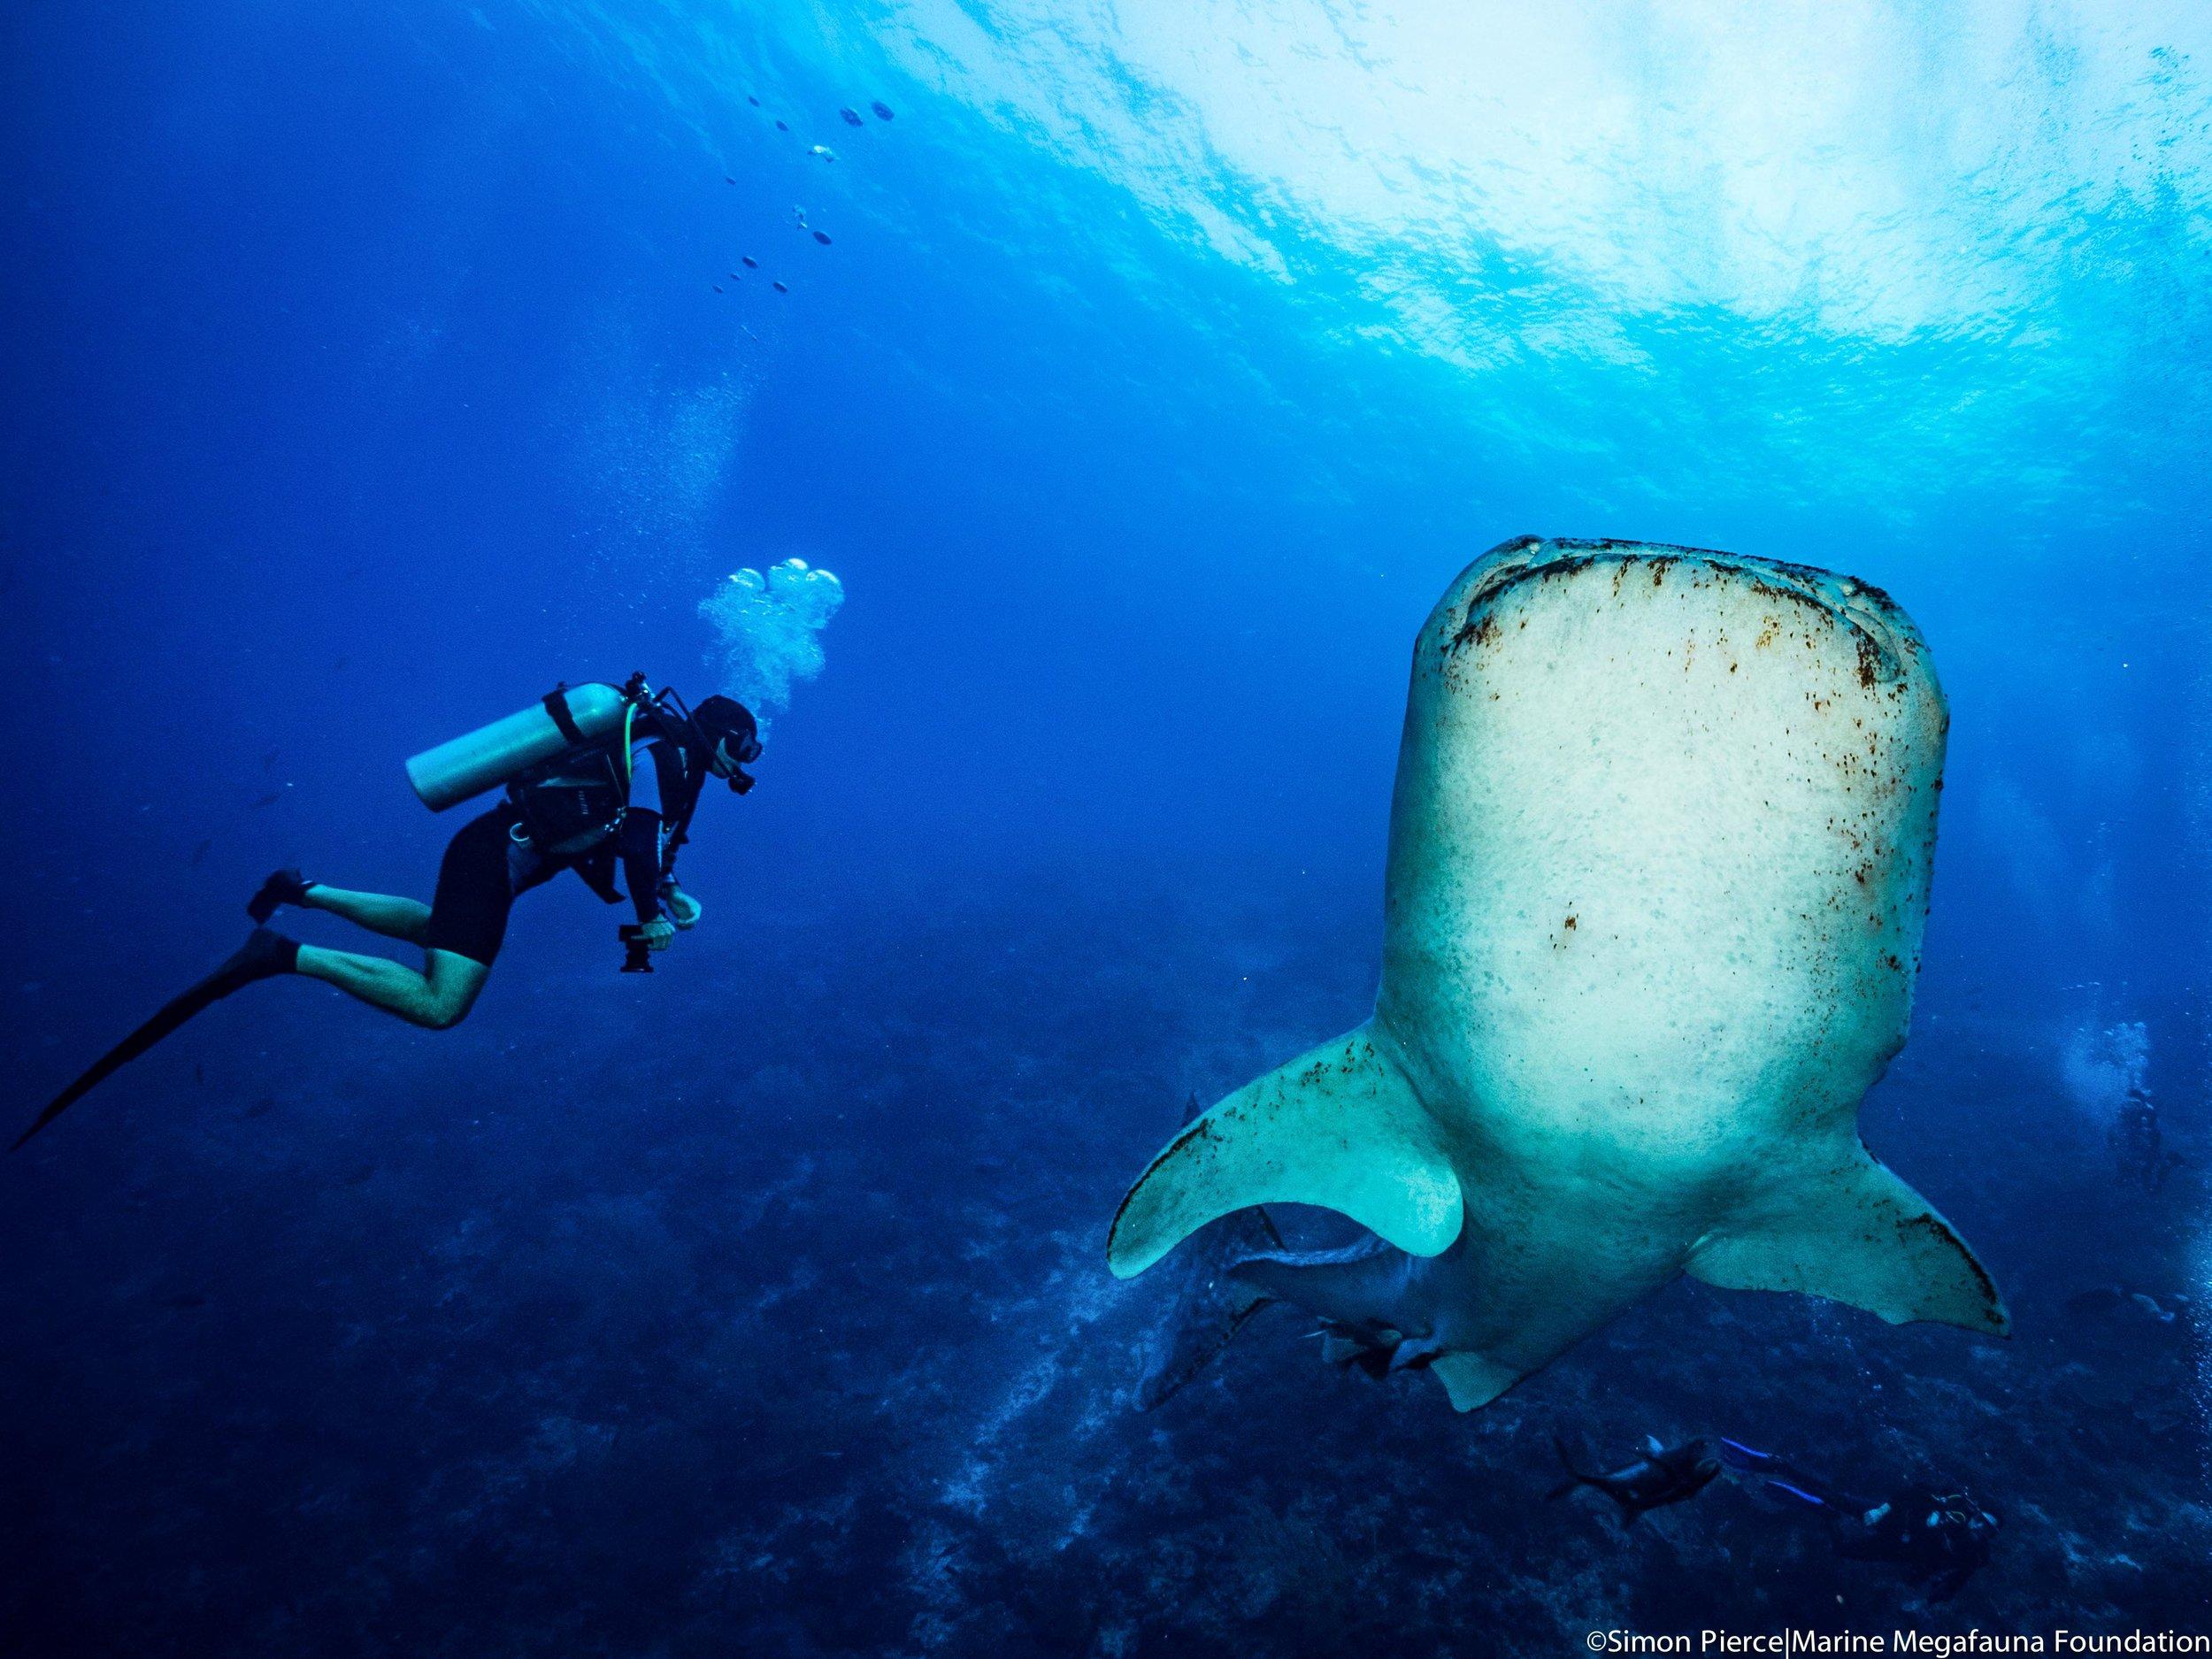 Gonzalo Araujo and the team encounter a whale shark on scuba in Tubbataha Reefs Natural Park.